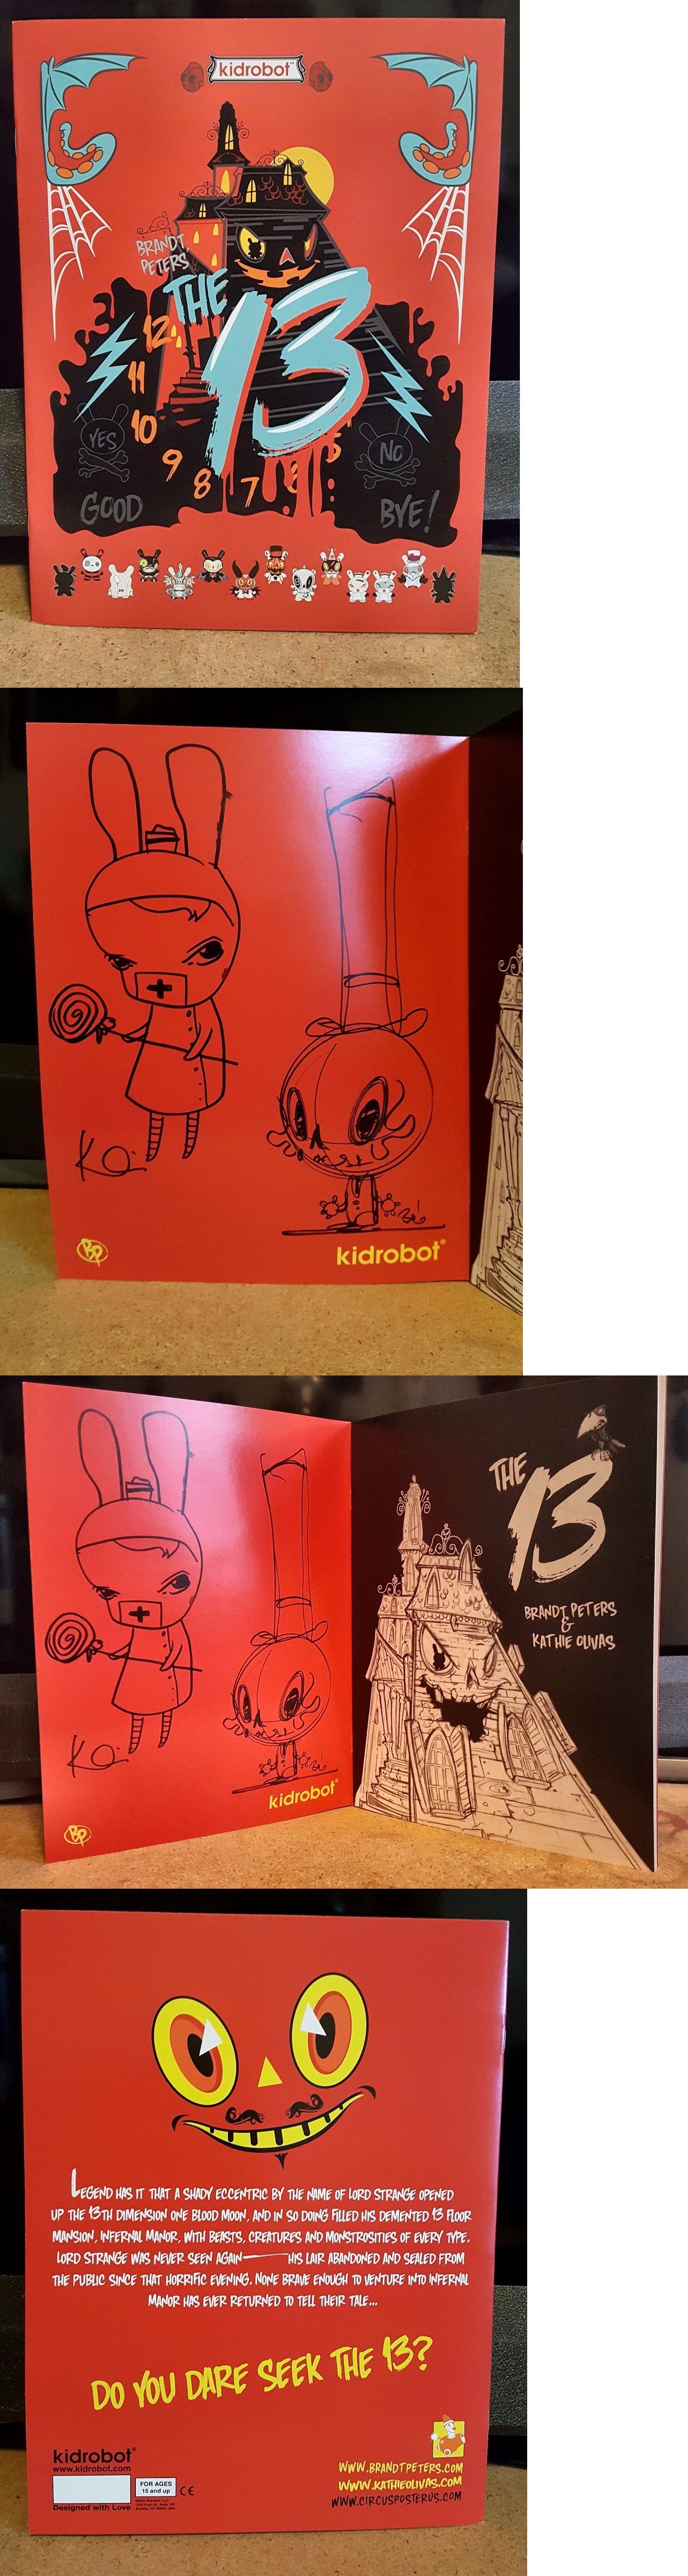 Designer And Urban Vinyl 158672 Brandt Peters Kathie Olivas Coloring Book Sign